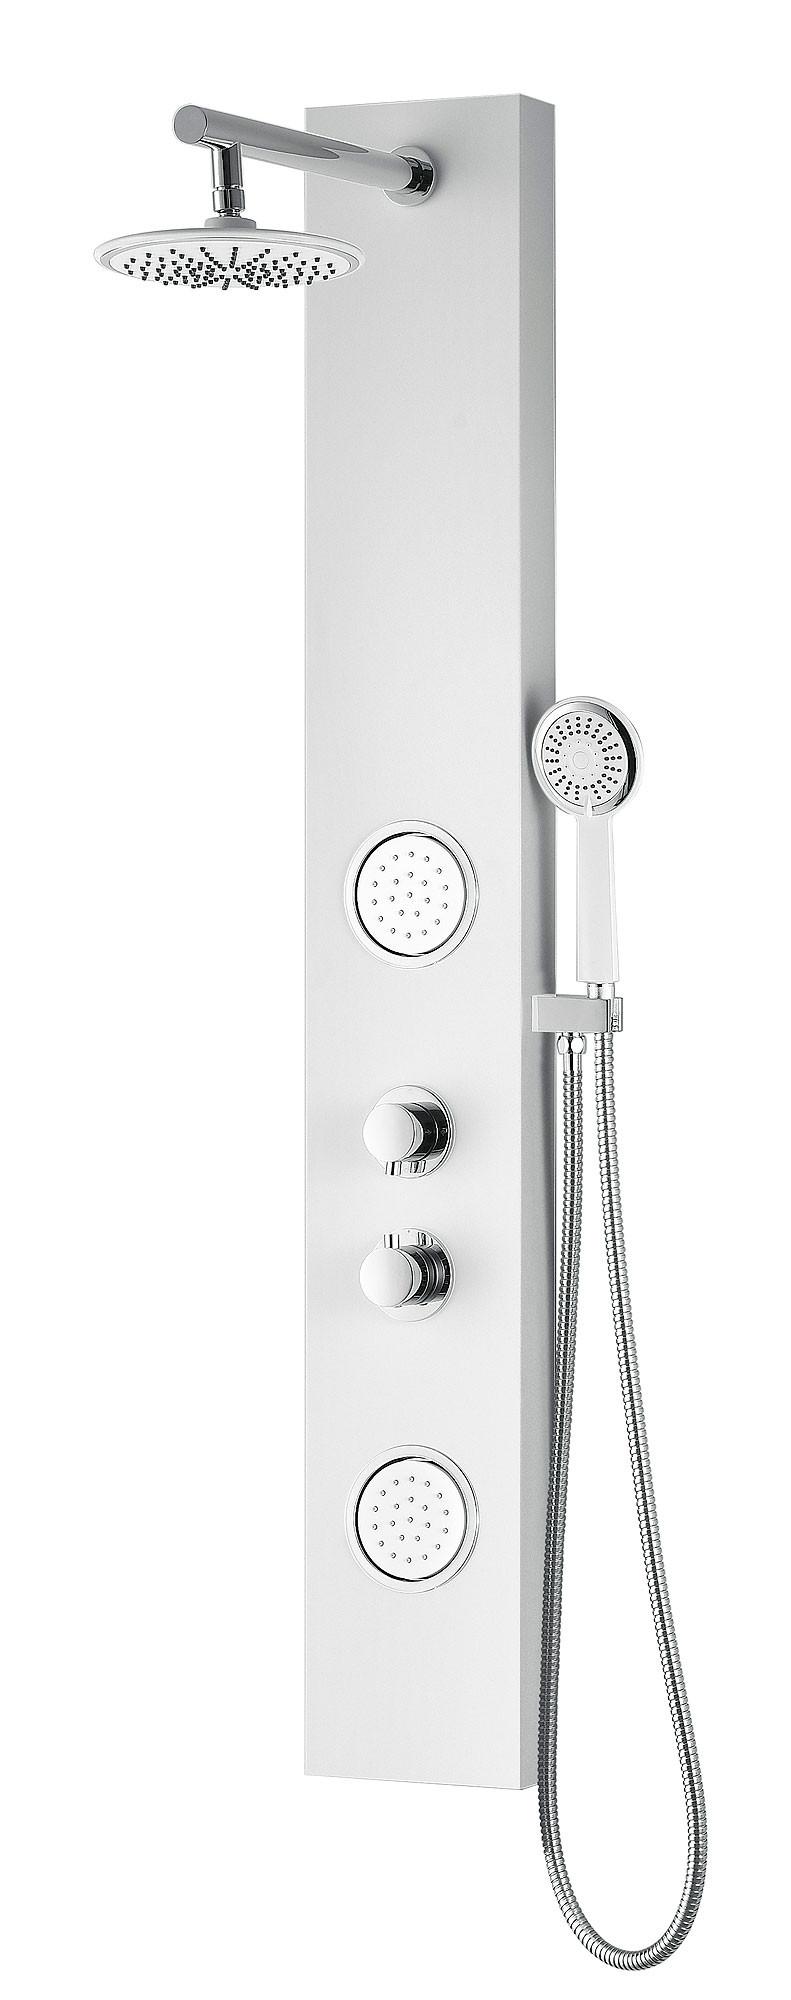 ANZZI SP-AZ057 Aquifer Shower Panel System With Rain Shower In White